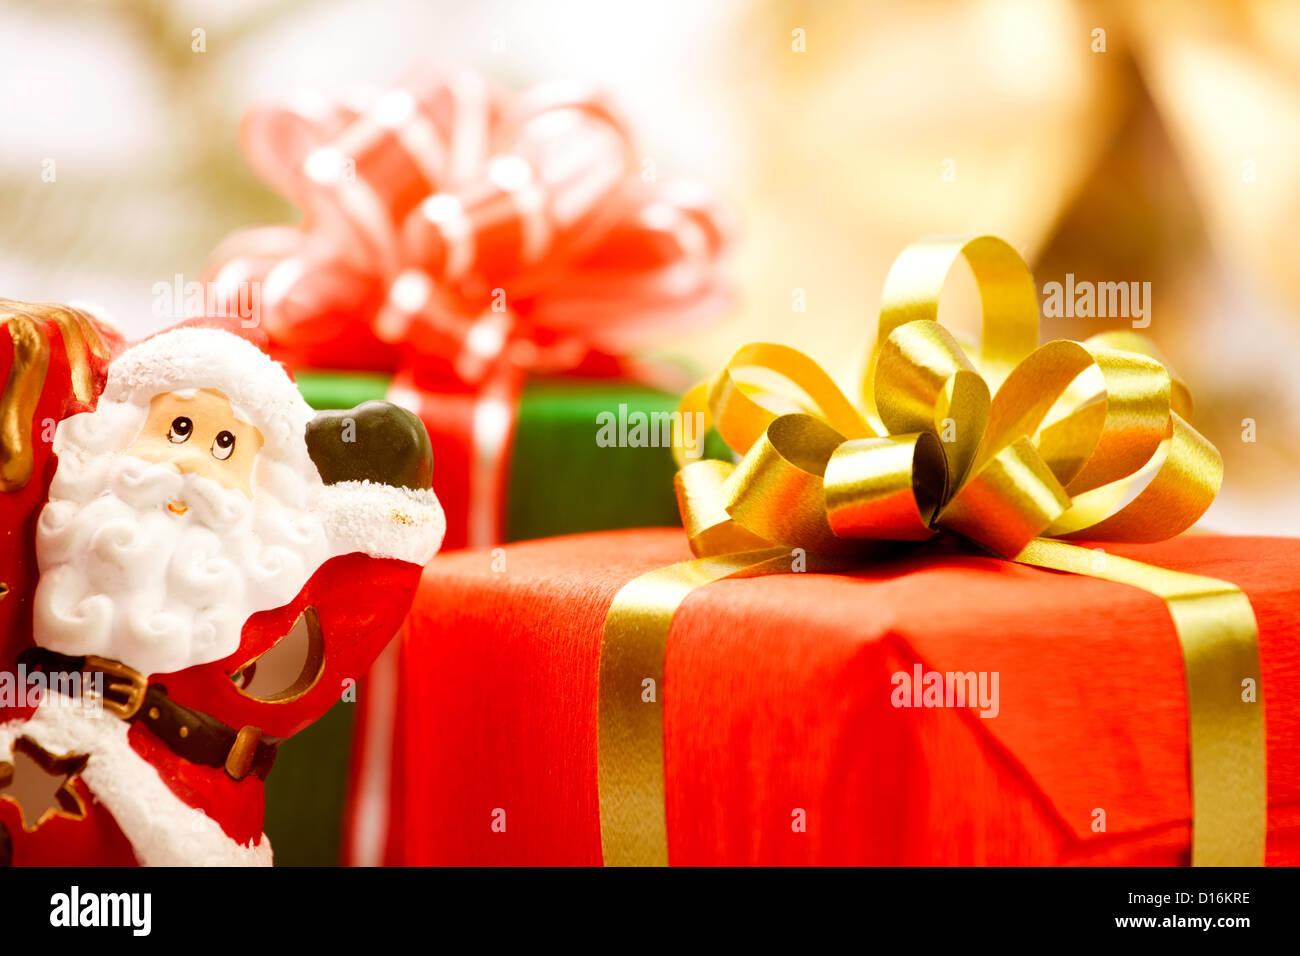 Caja de regalo roja actual santa closeup Imagen De Stock